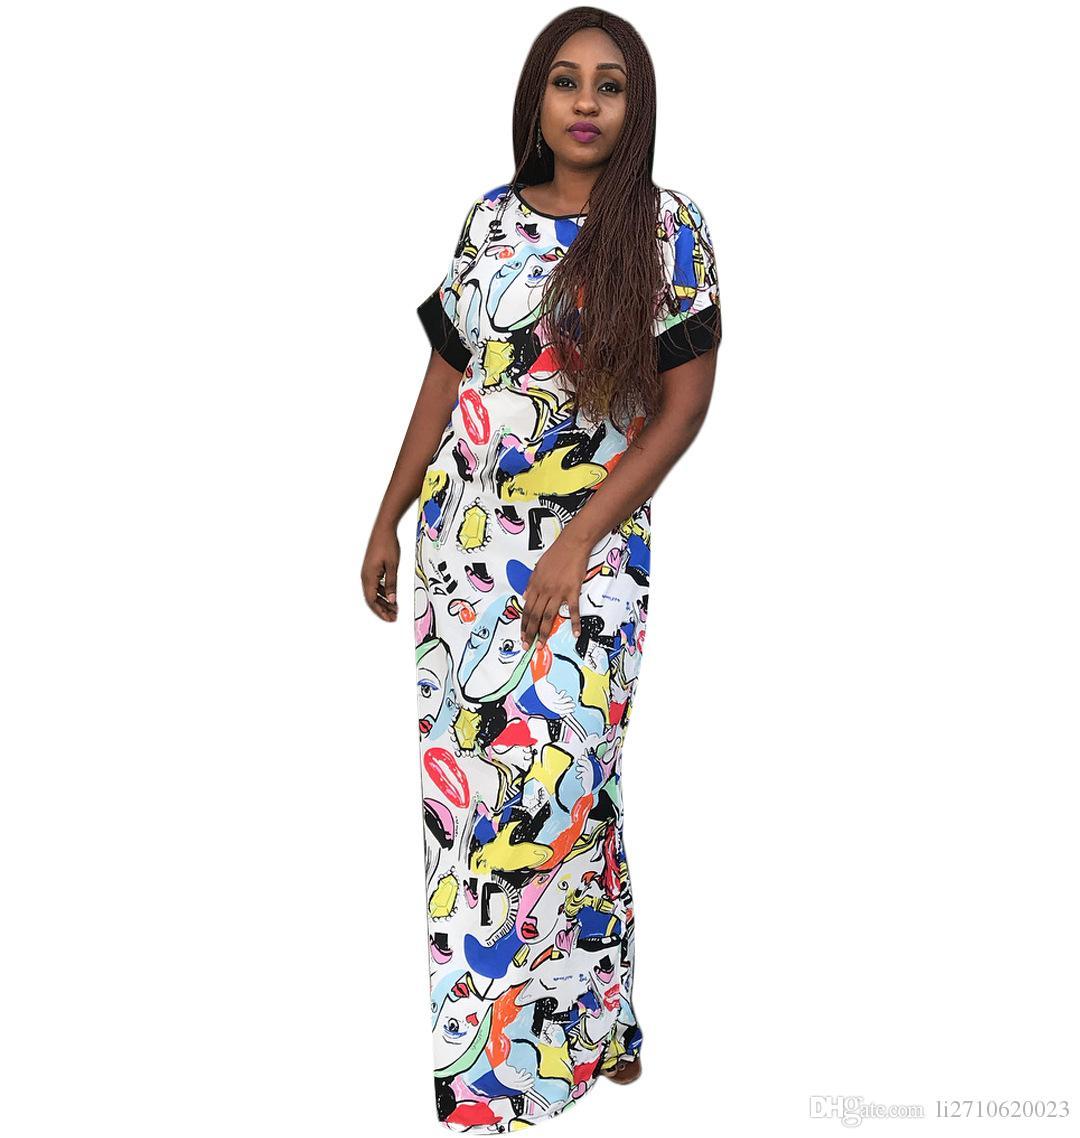 Compre Vestidos Africanos Para Las Mujeres 2018 Moda Sexy Vestido De  Impresión Africana Kaftan Lady Casual Dress Mujeres De Verano Largo Vestido  Maxi ... c9c80d38e9e5